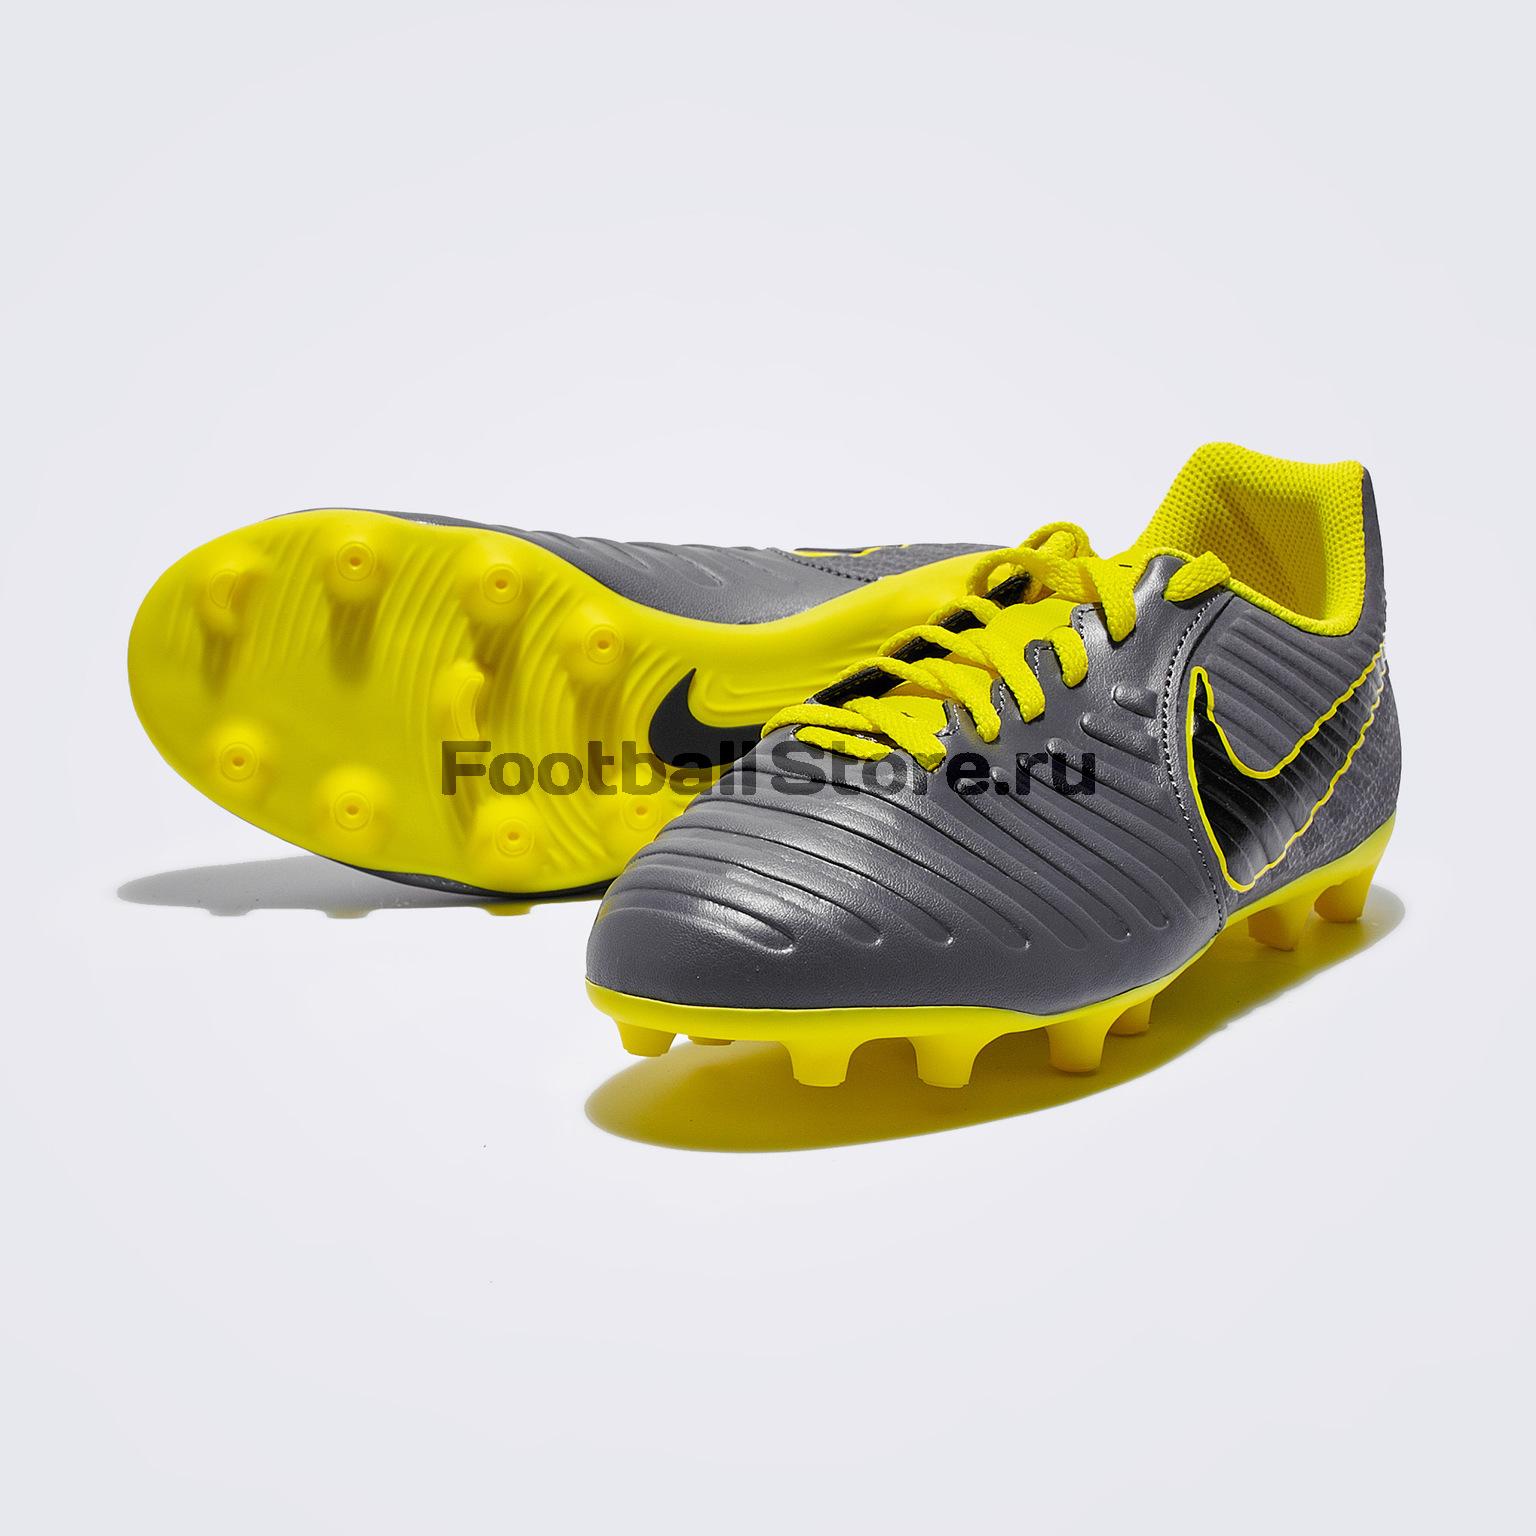 Бутсы детские Nike Legend 7 Club FG AO2300-070 бутсы nike mercurial victory iii fg 509128 800